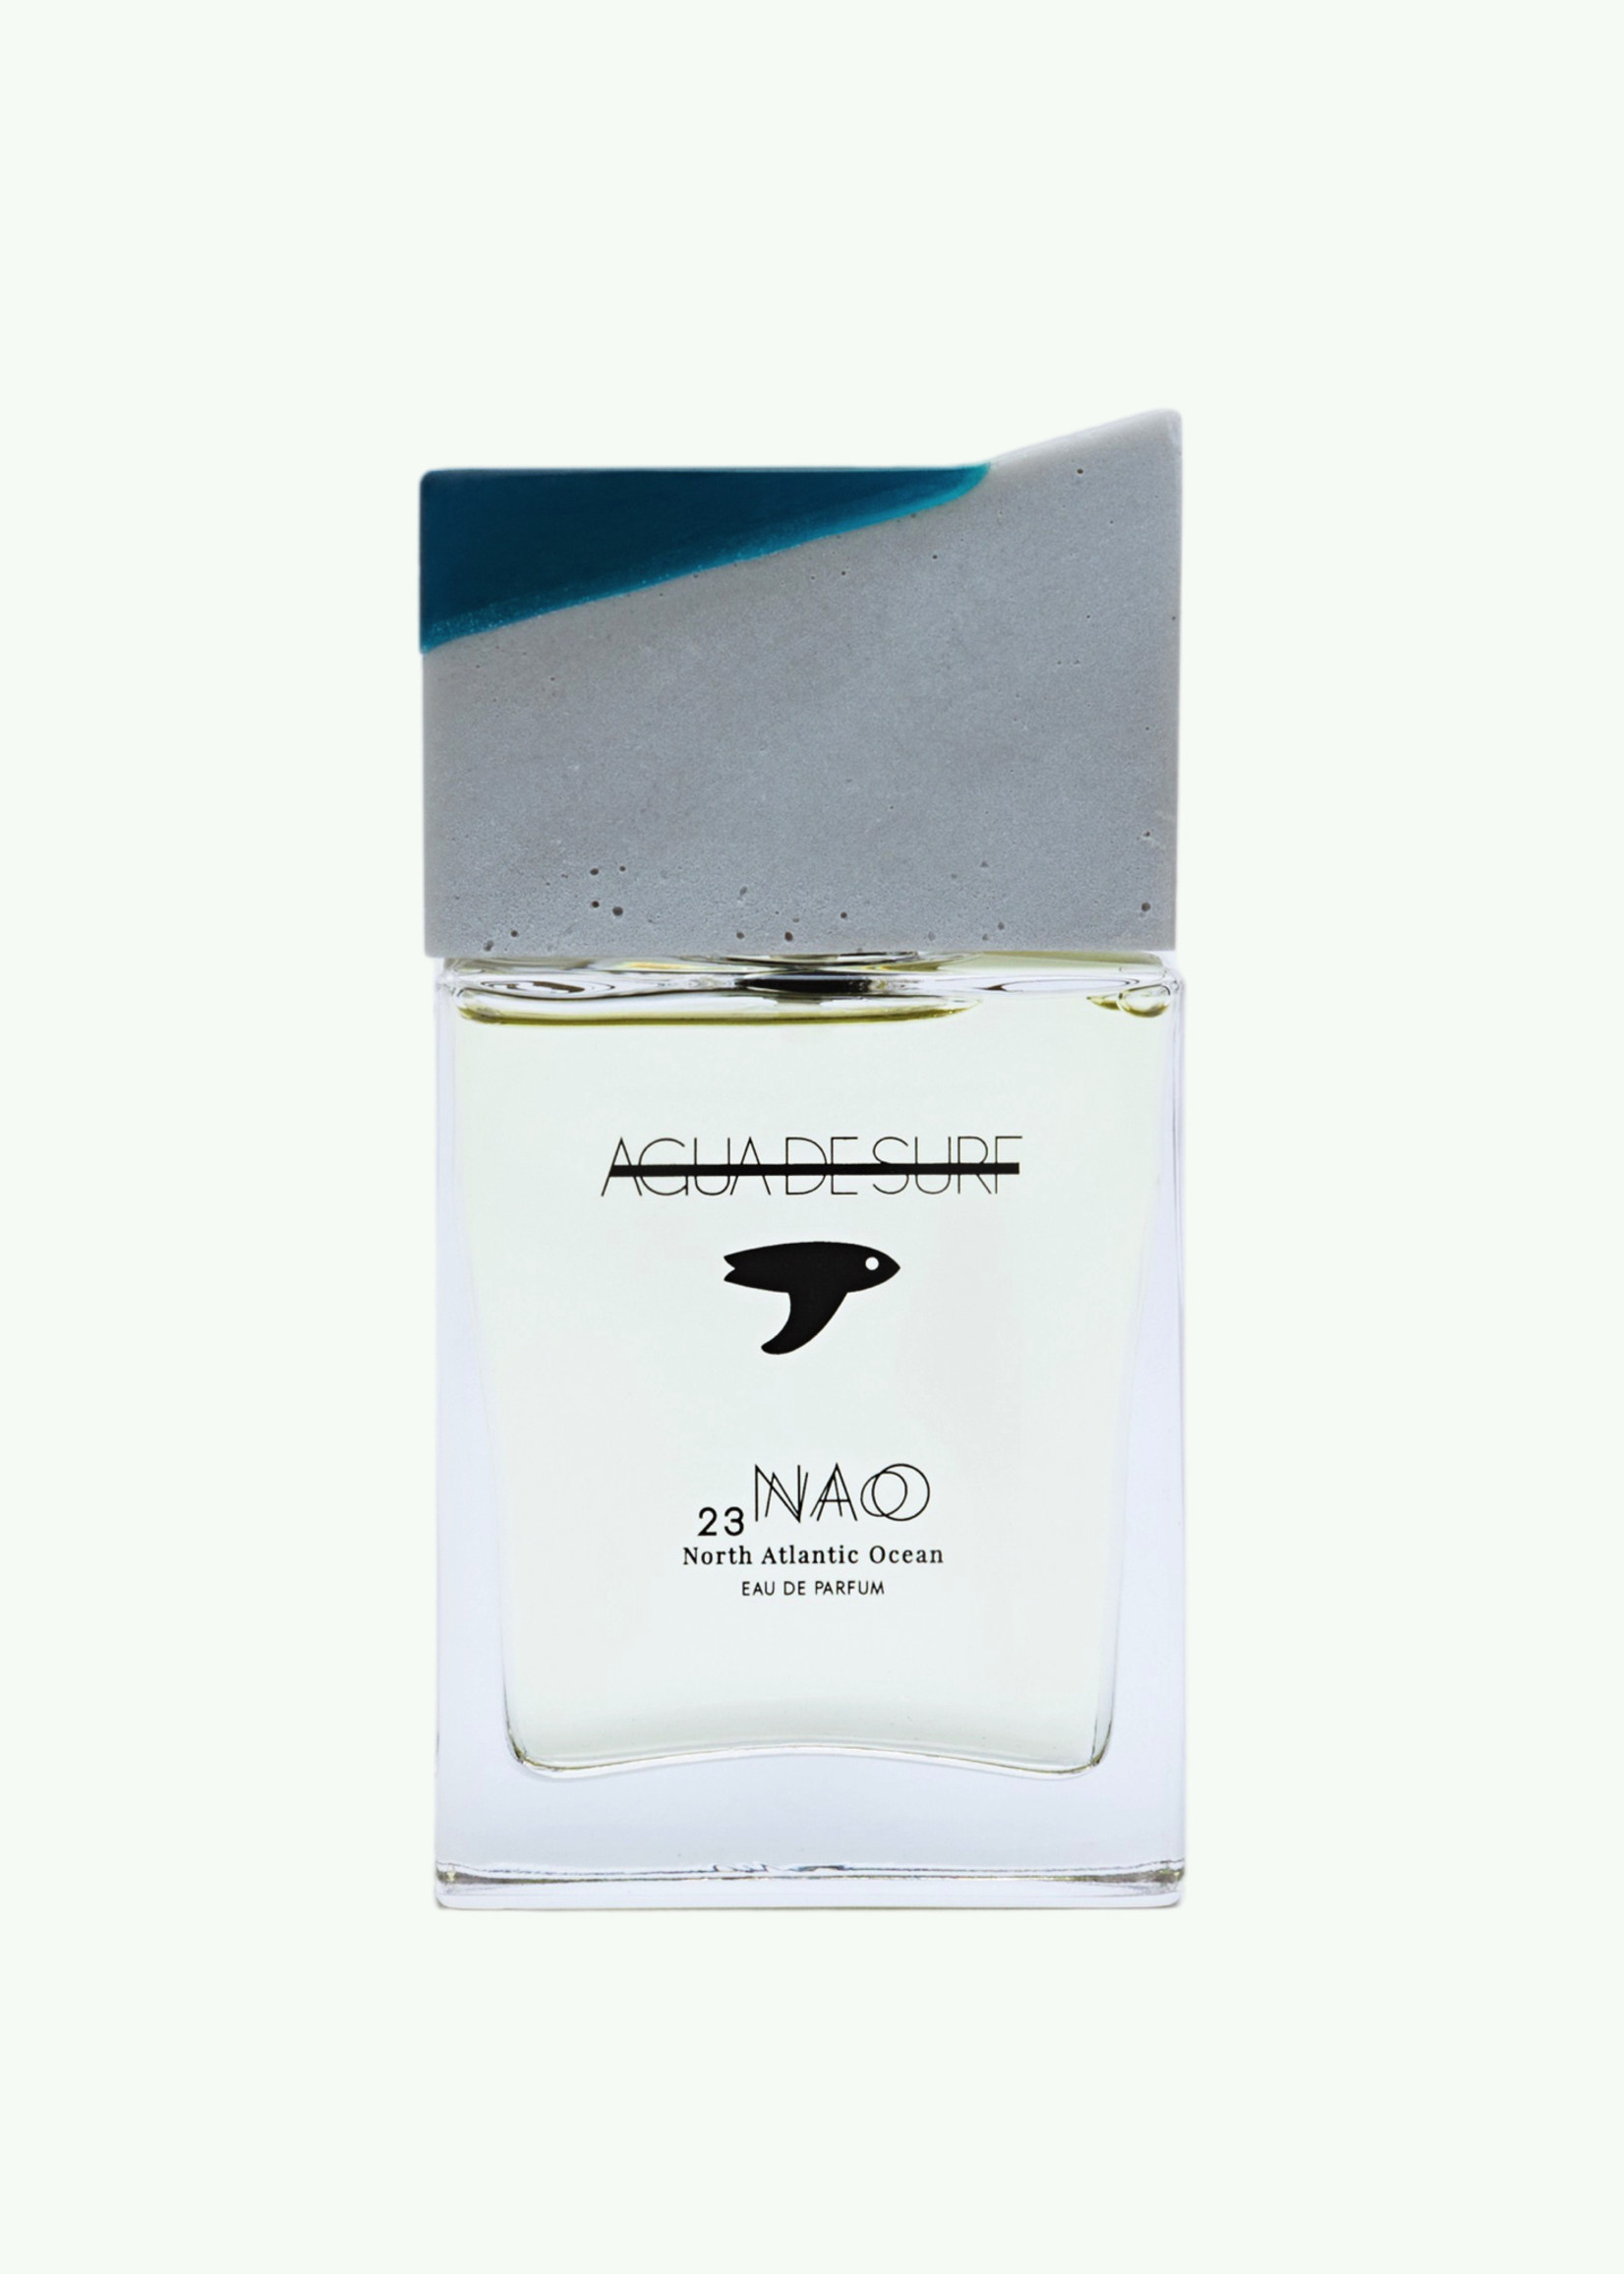 Agua de Surf Agua de Surf - 23NAO - Eau de Parfum